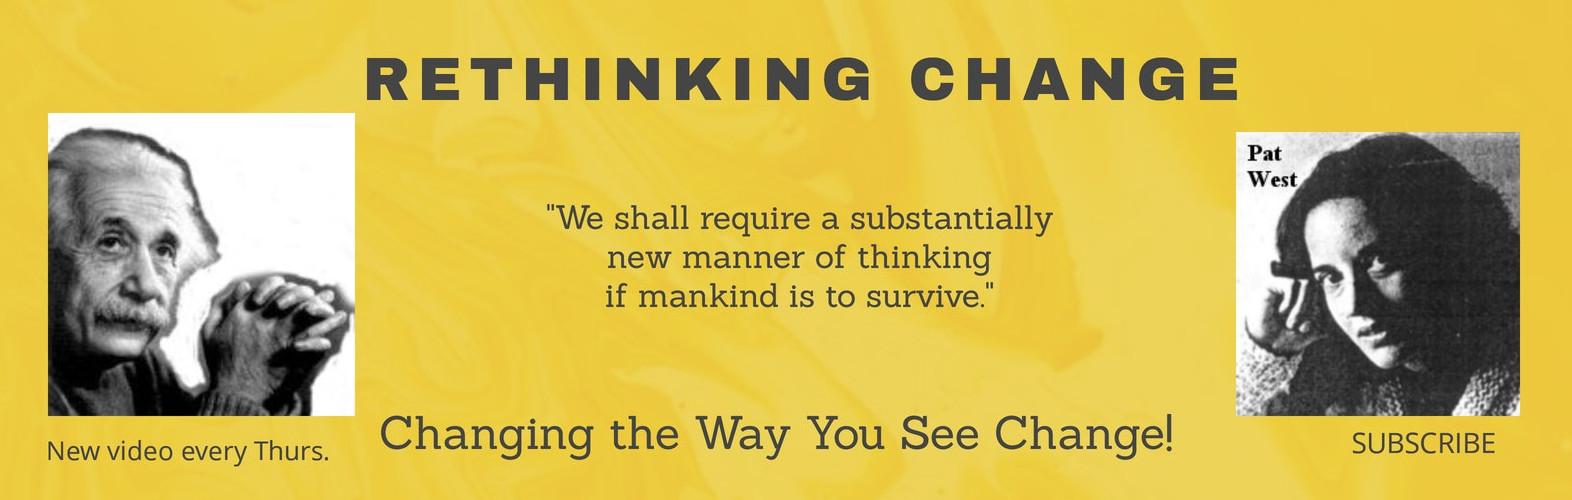 Rethinking Change Banner